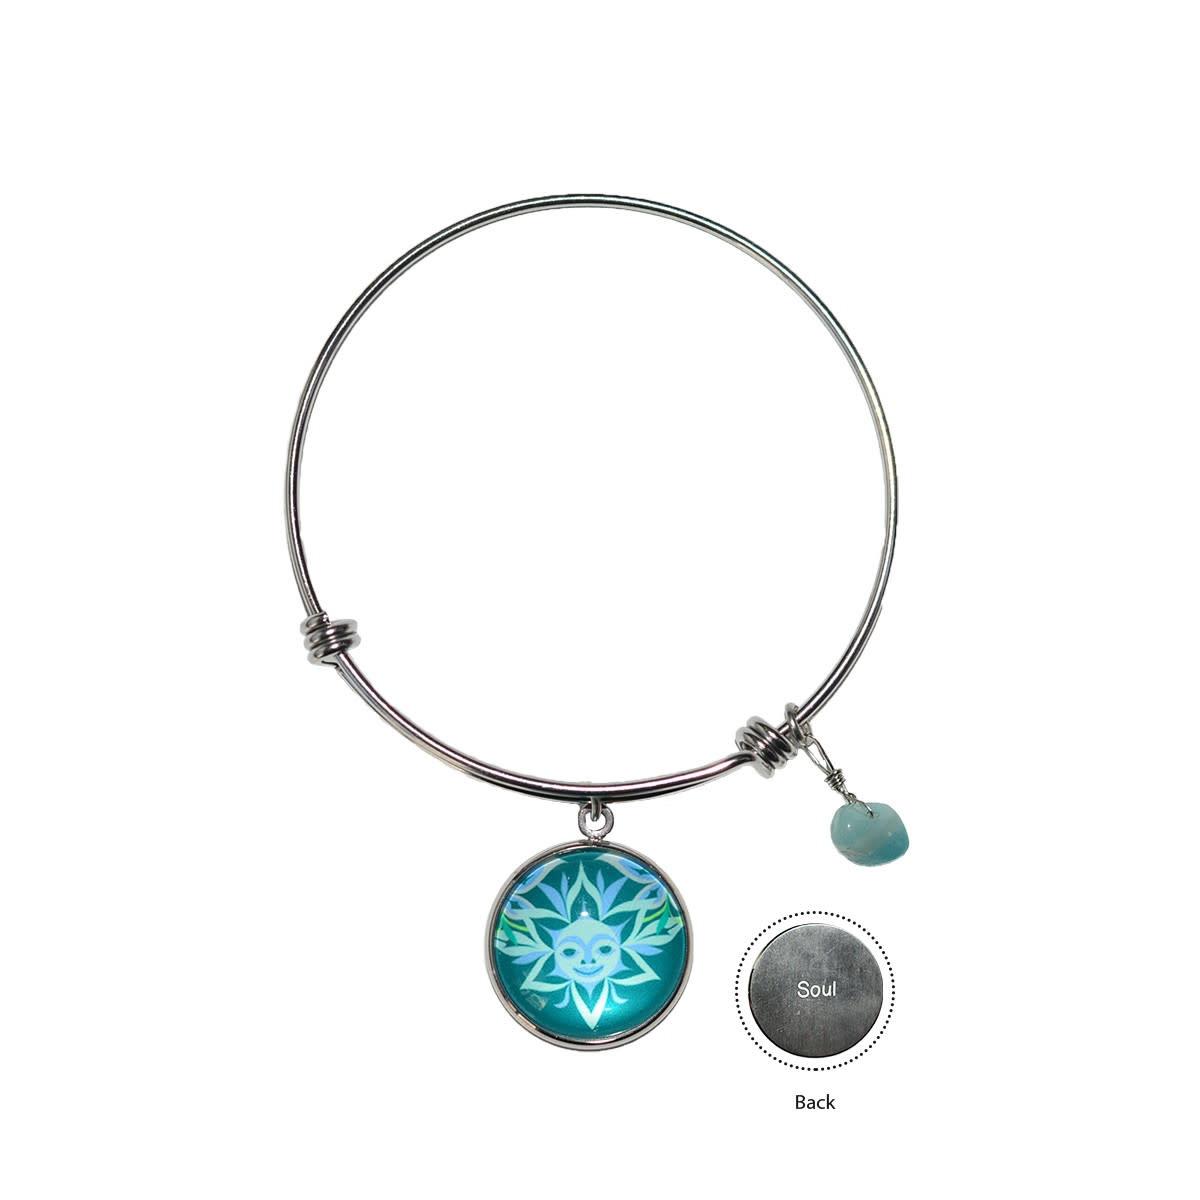 Circle Charm Bangle - Soul Blossom by Simone Diamond-2